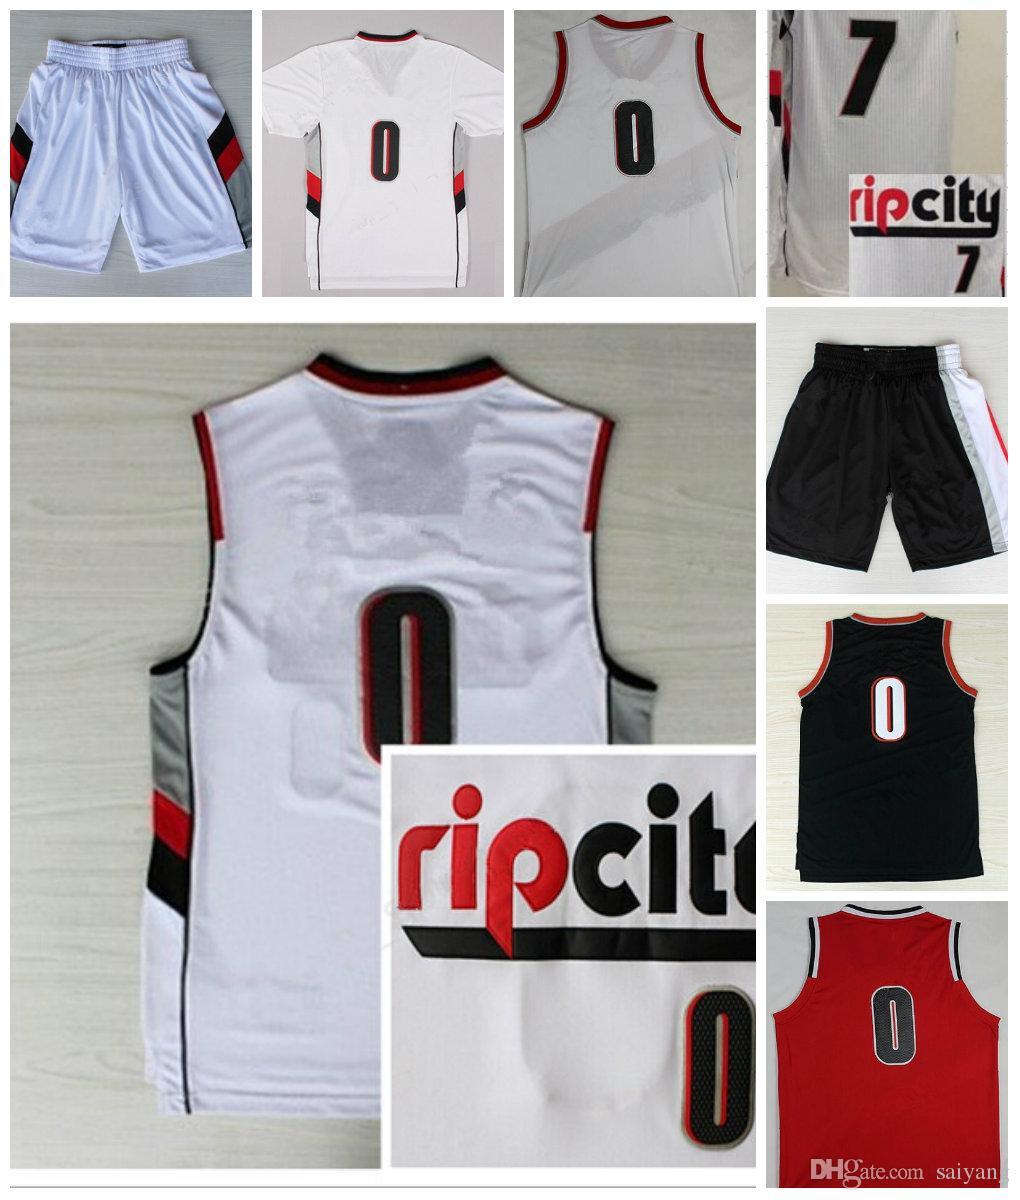 timeless design baf57 60da1 2019 Wholesale RipCity 0 Damian Lillard Jersey Mens 7 Brandon Roy Shorts  Rip City Uniforms Rev 30 New Material Team Color Retro Red White Black From  ...